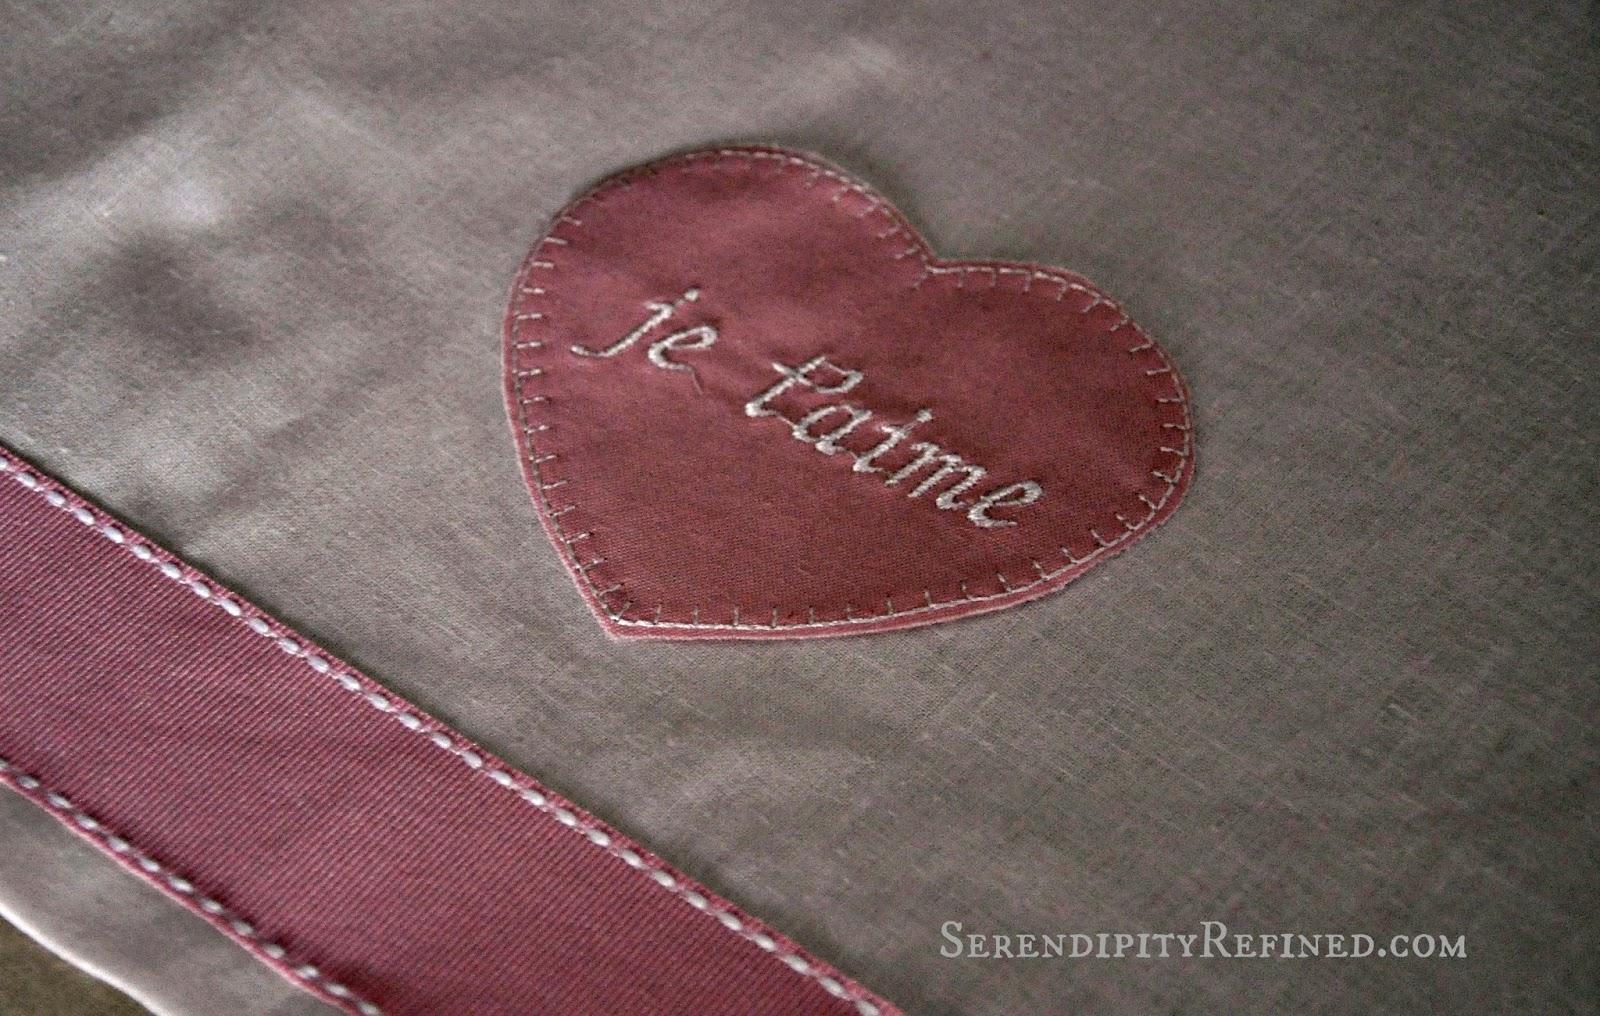 Serendipity Refined Blog Pottery Barn Inspired Valentine